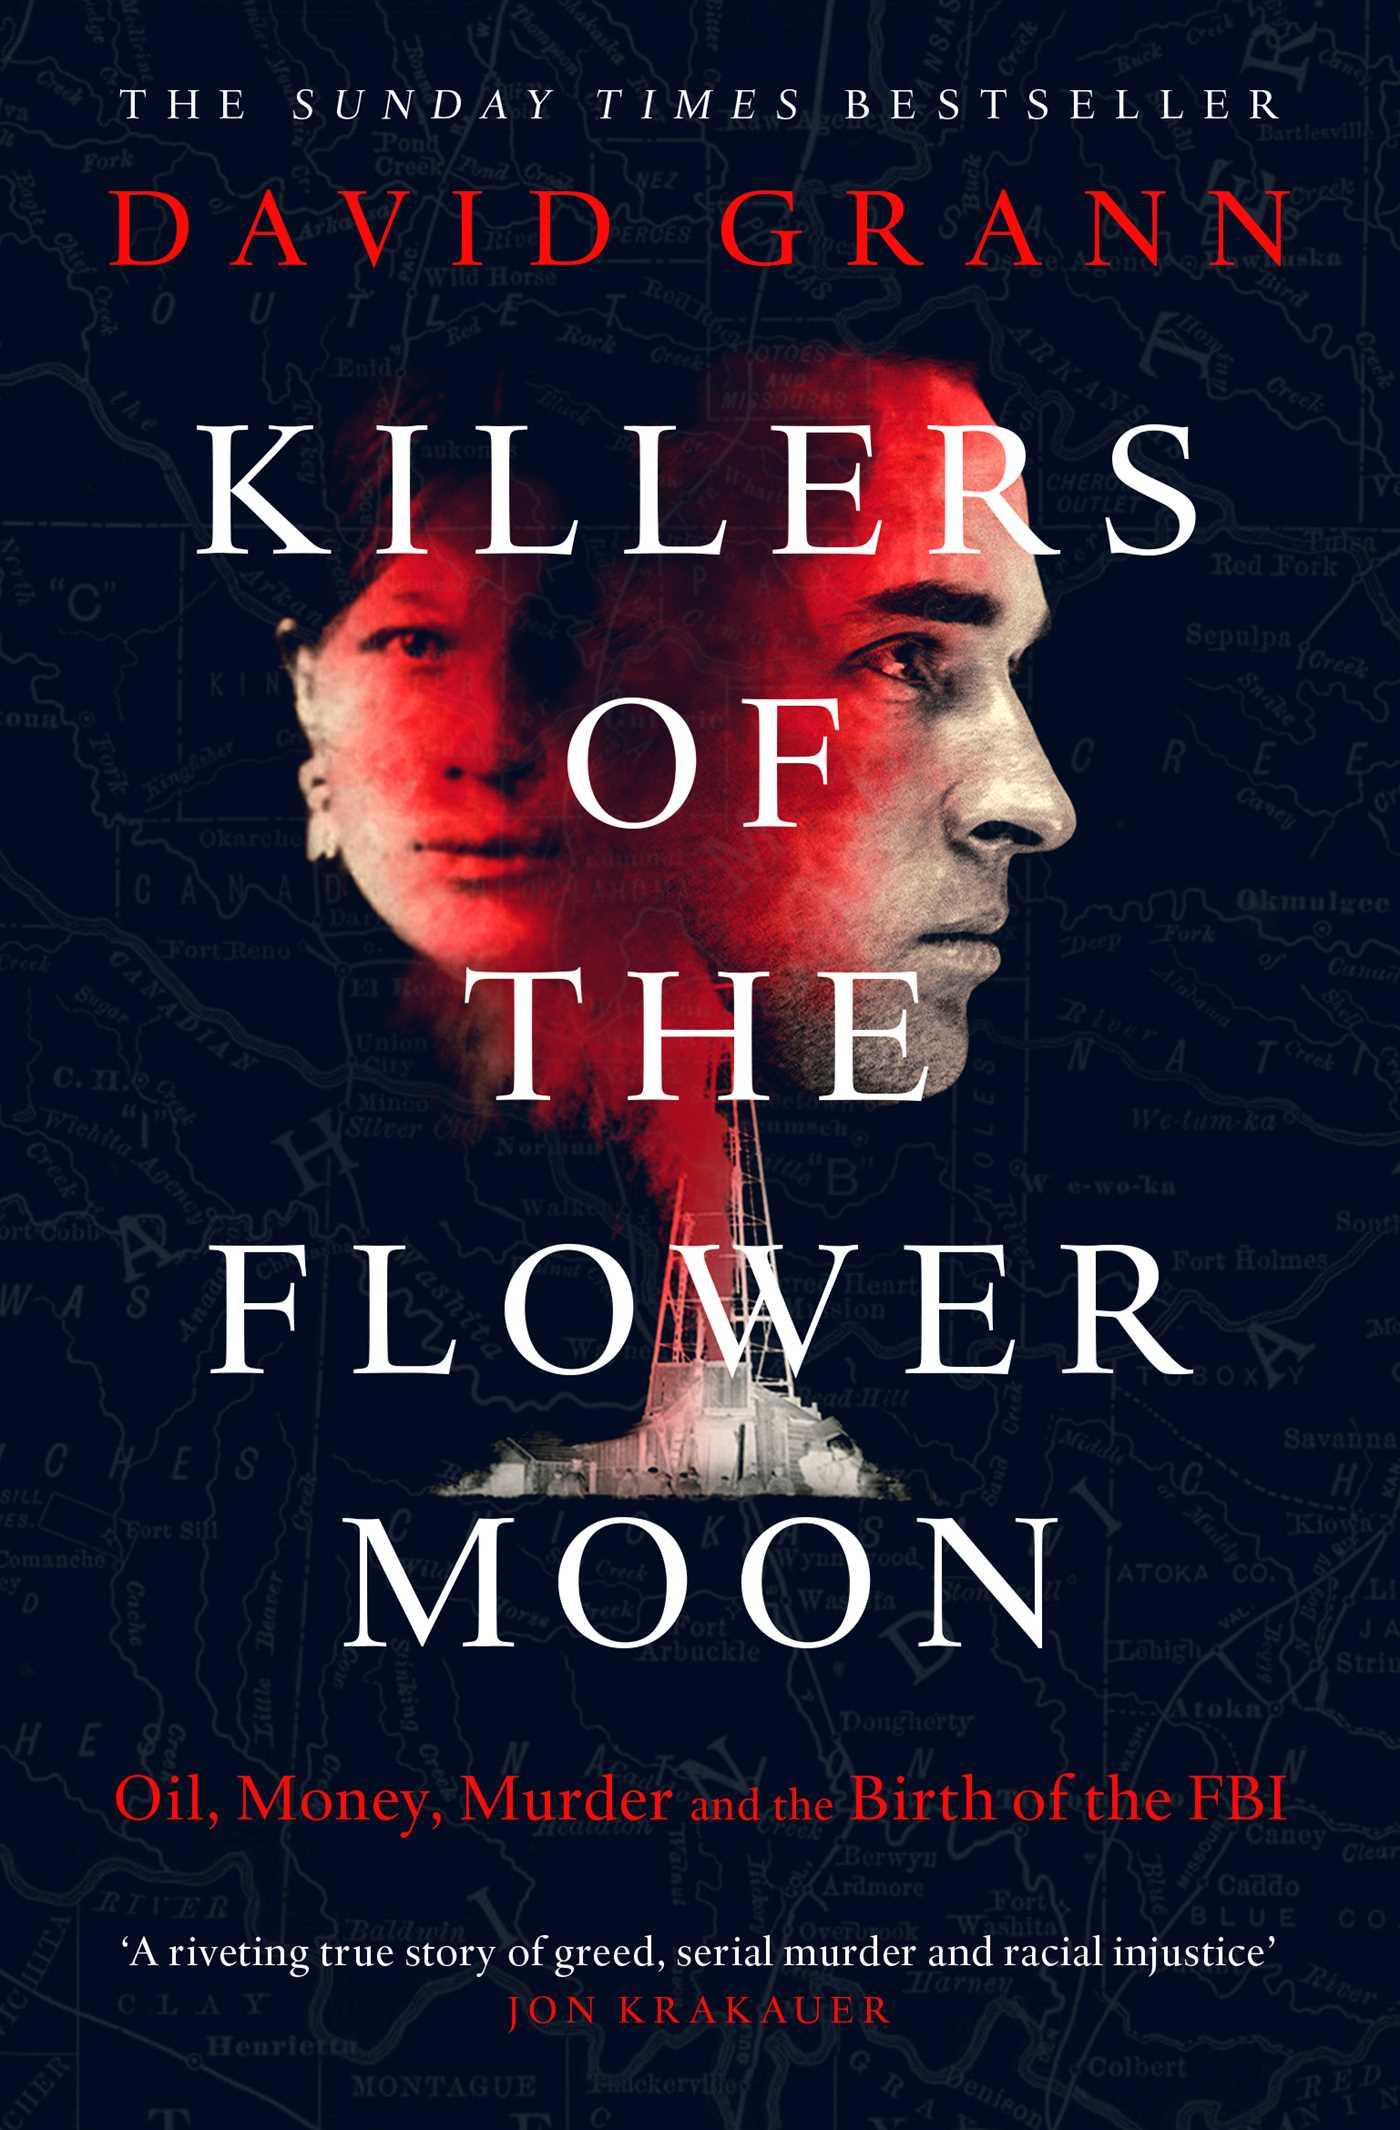 killers-of-the-flower-moon-9780857209030_hr.jpg